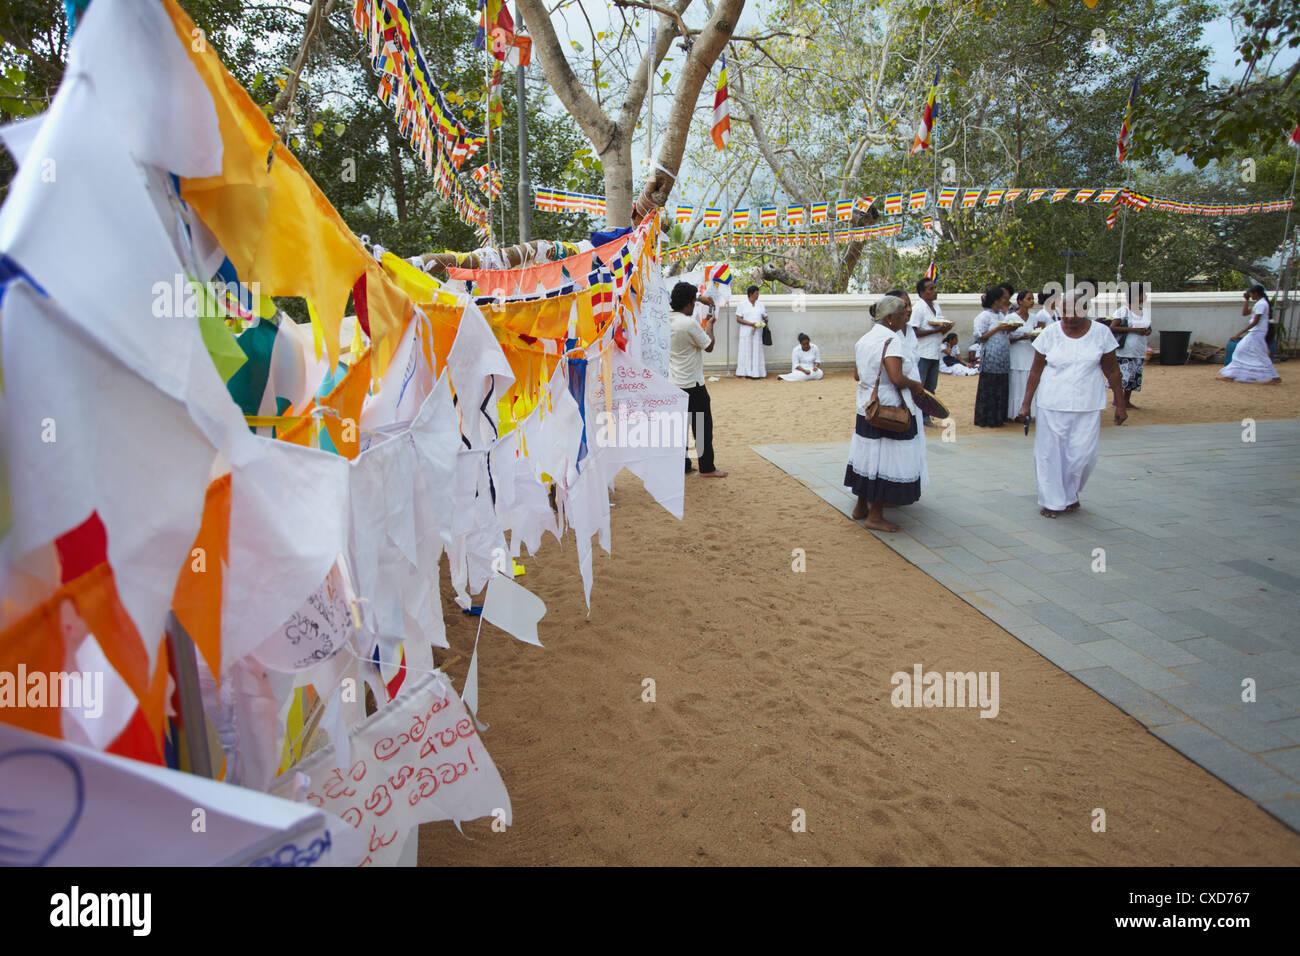 People praying at Sri Maha Bodhi (sacred bodhi tree), Anuradhapura, North Central Province, Sri Lanka Stock Photo